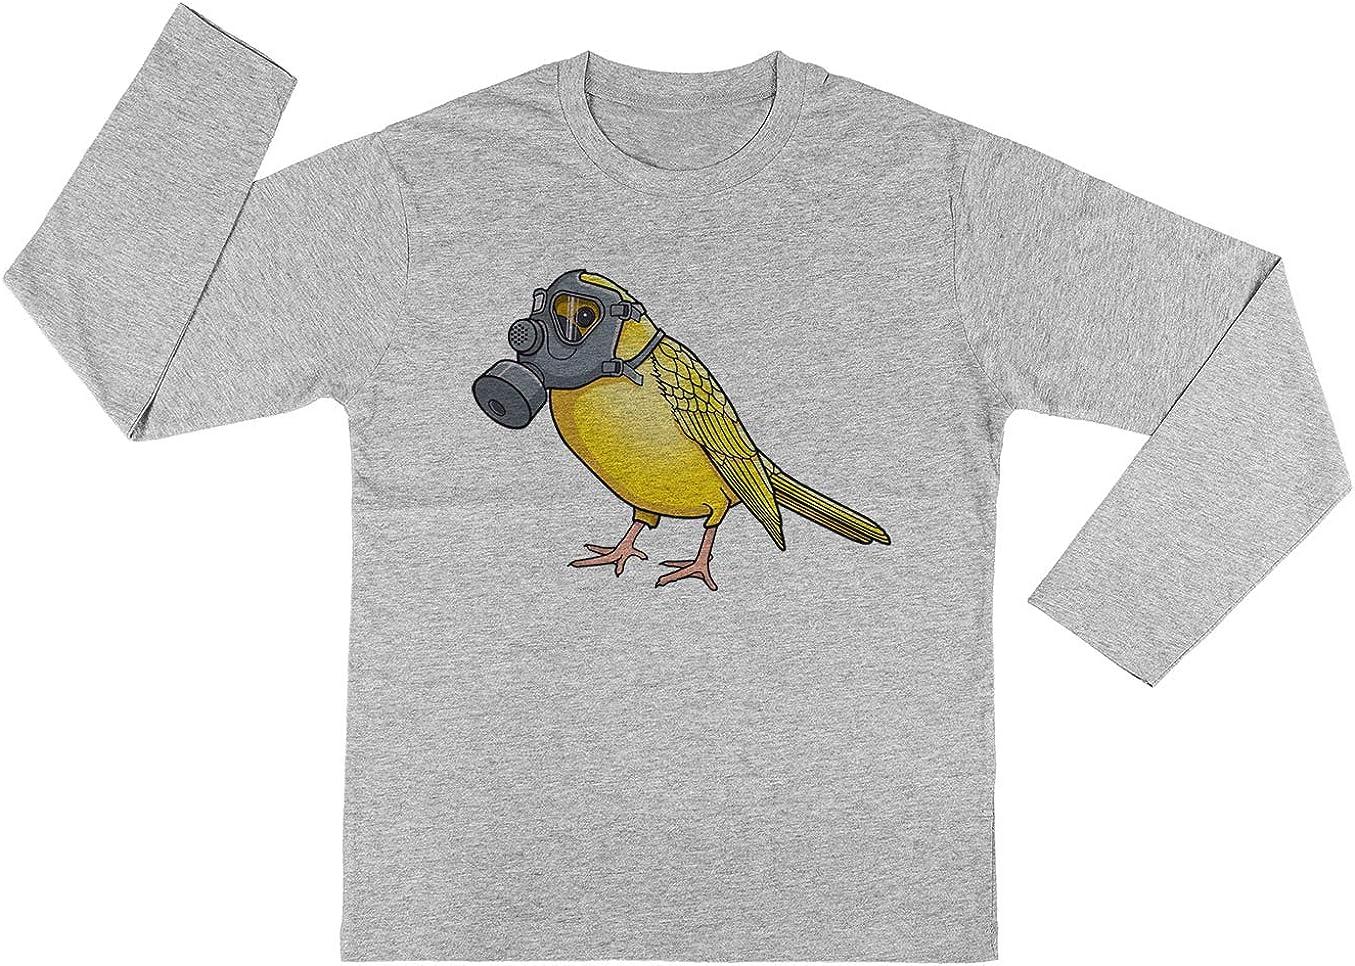 Los Aves Arent Canto Chicos Chicas Unisexo Gris Camiseta Mangas Largas Unisex T-Shirt Kids: Amazon.es: Ropa y accesorios